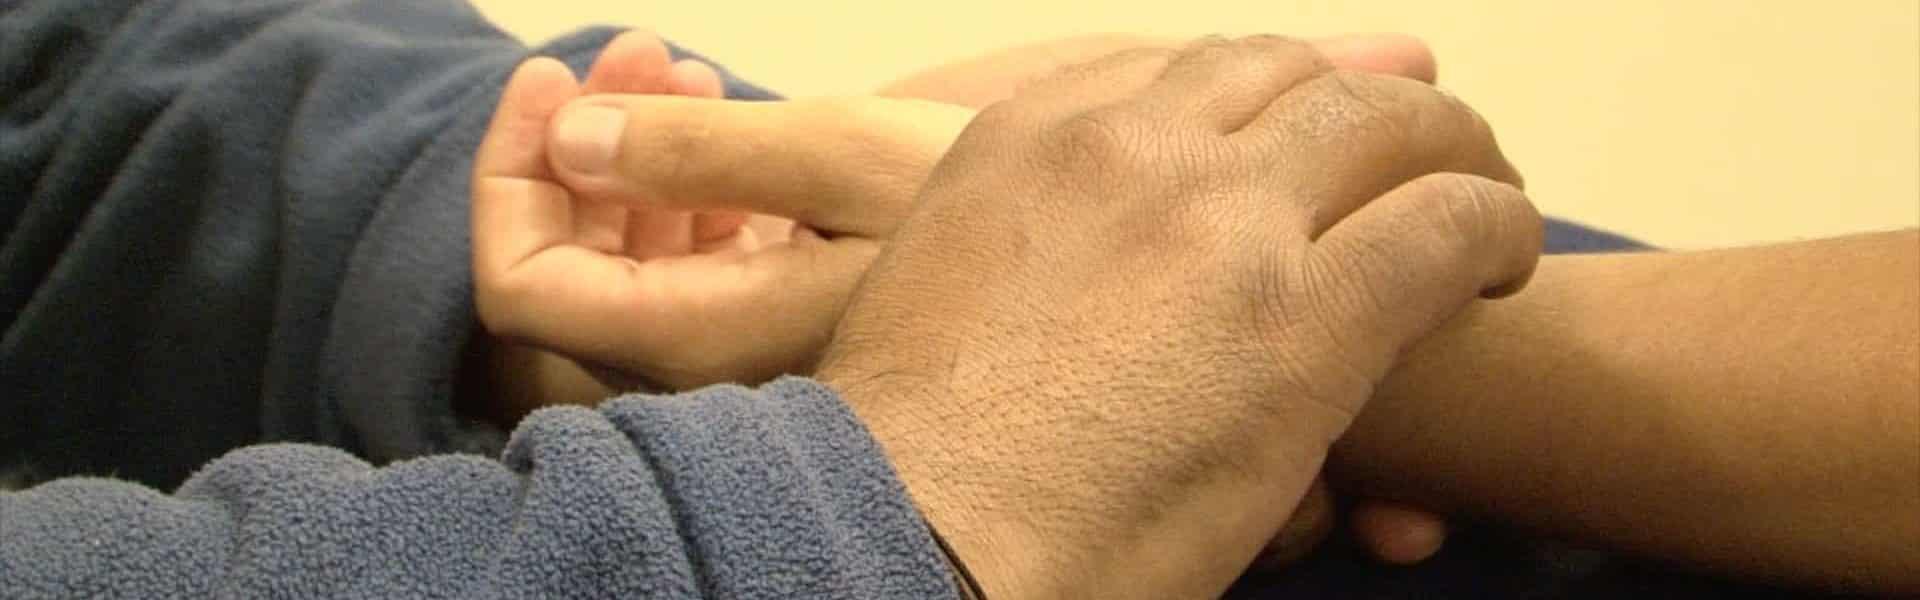 Wellness retreats provide pulse diagnosis.